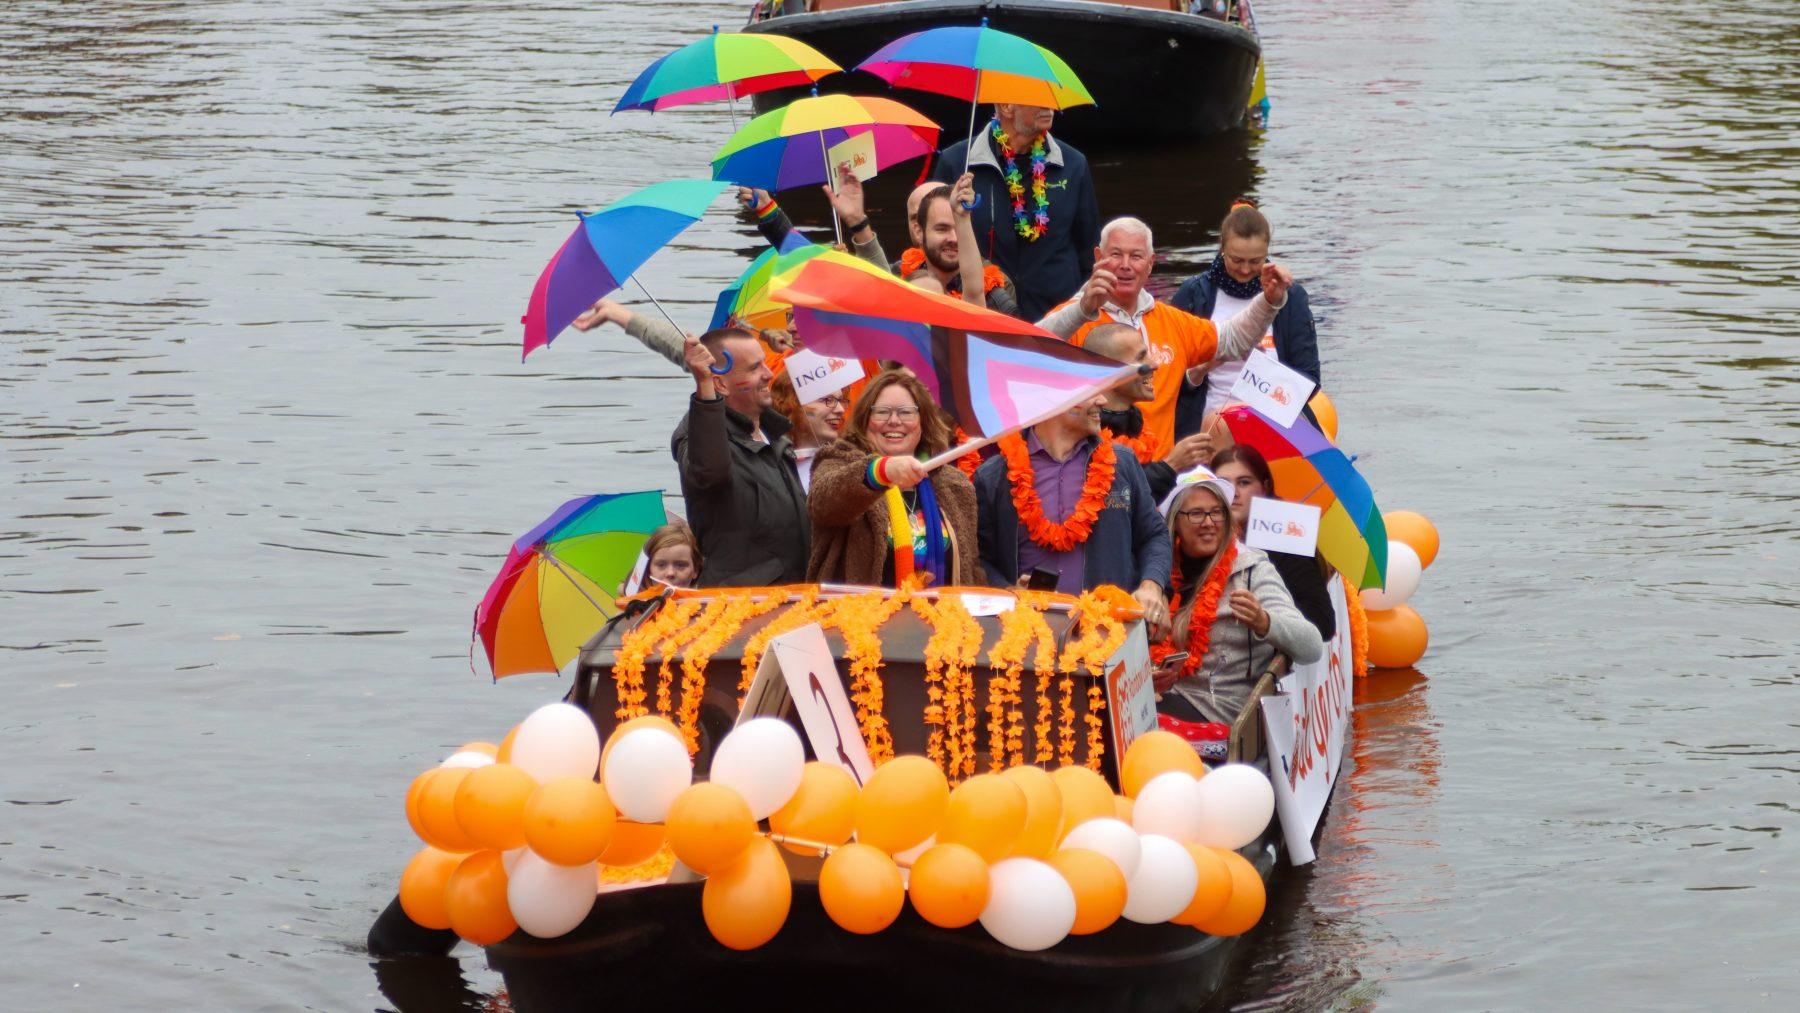 Feest in Friesland: Leeuwarden viert Roze Zaterdag met kleurrijke botenparade